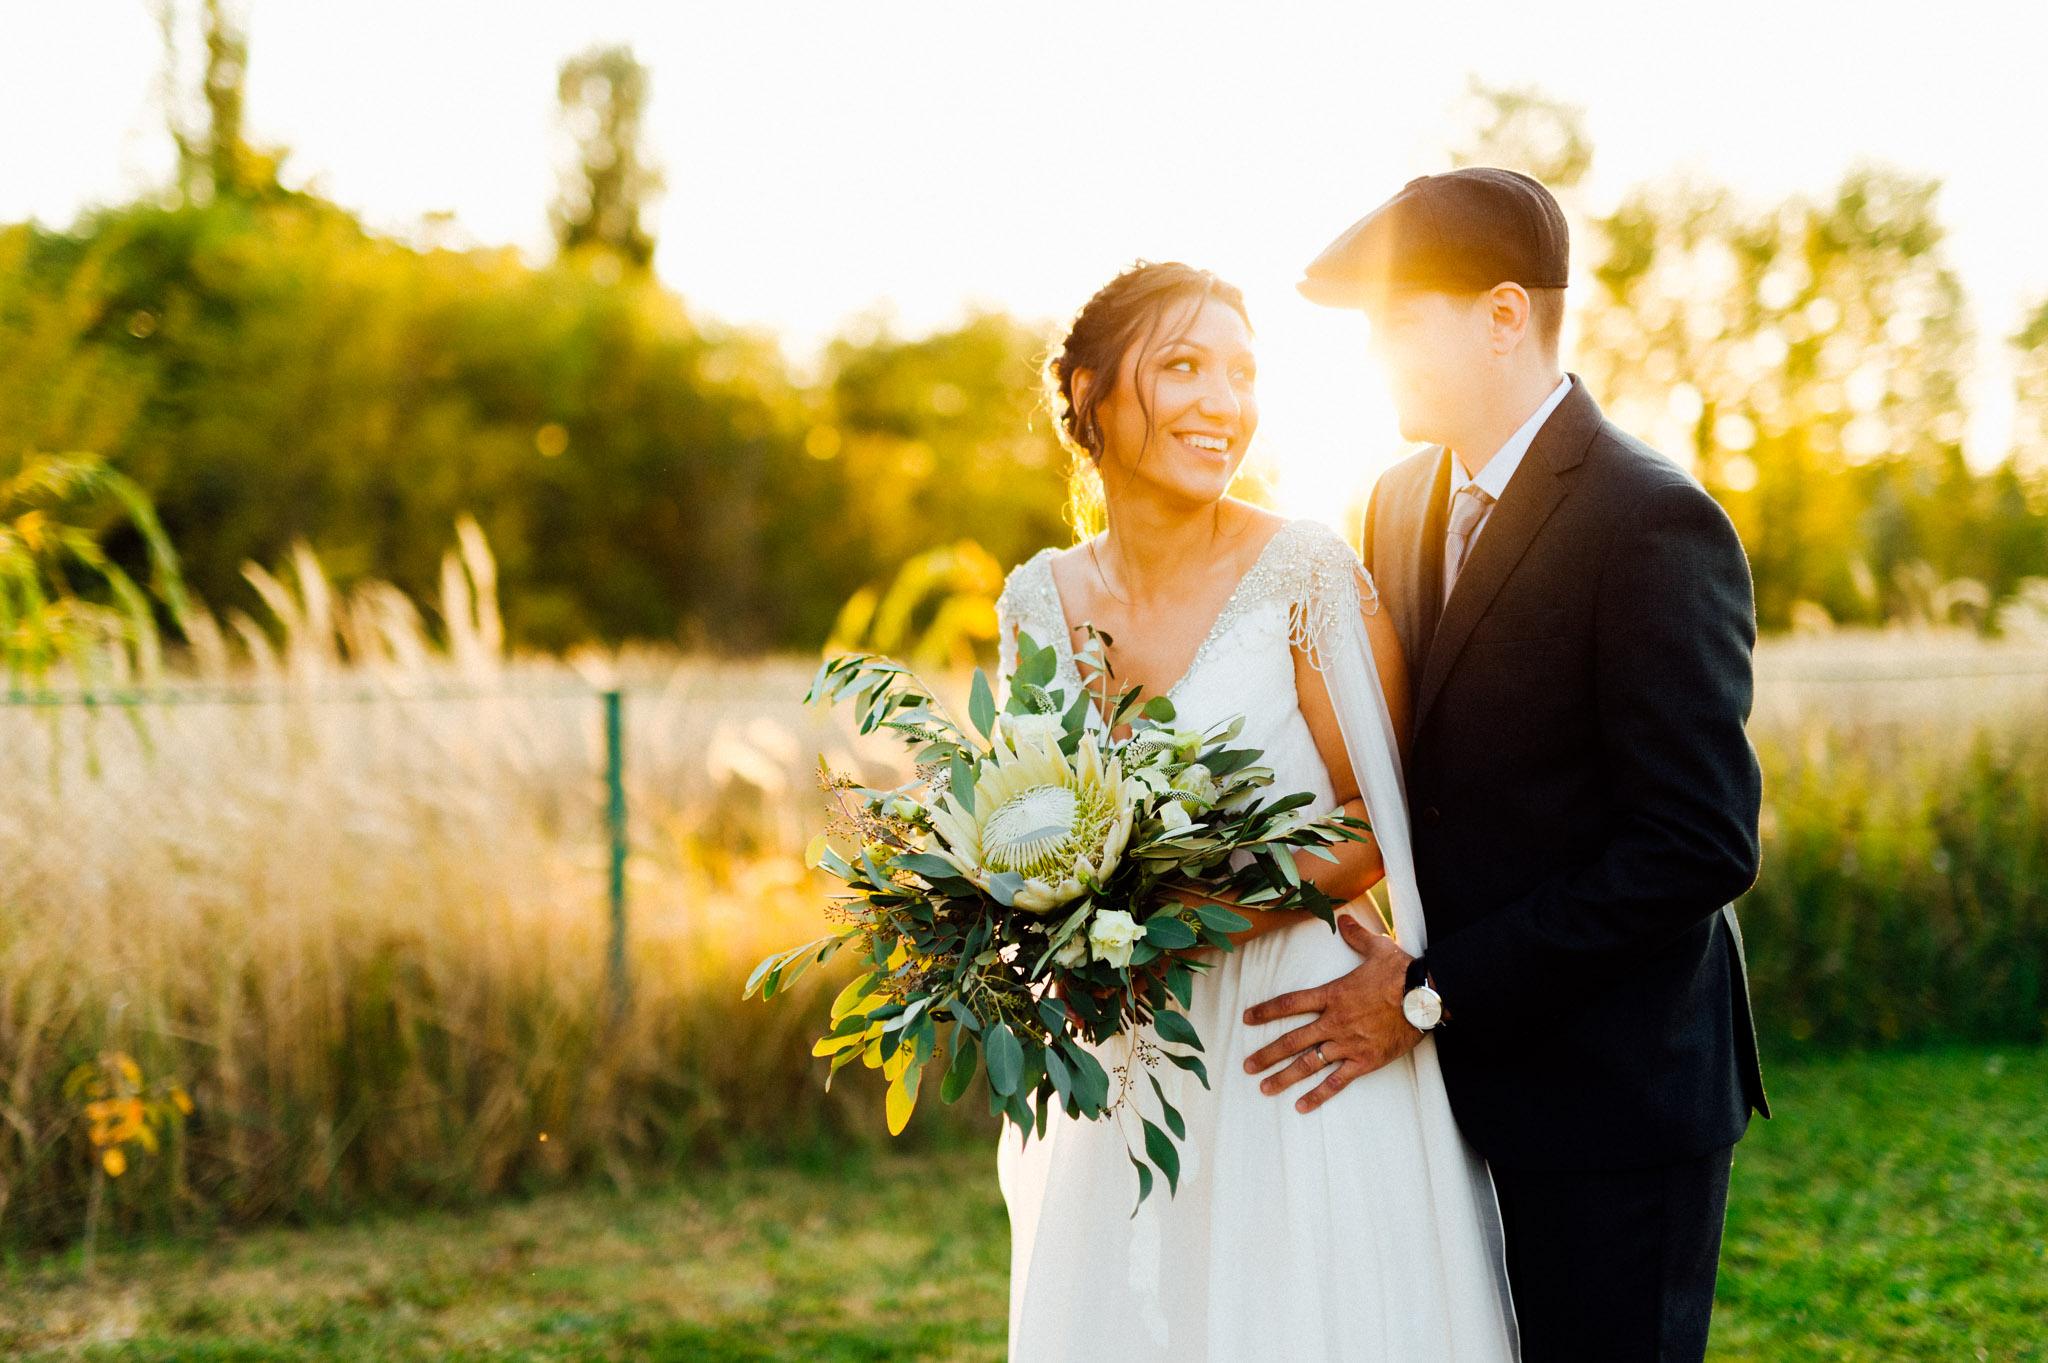 Nunta in stil rustic la The Green Spot Wedding BARN Ciolpani Bucuresti